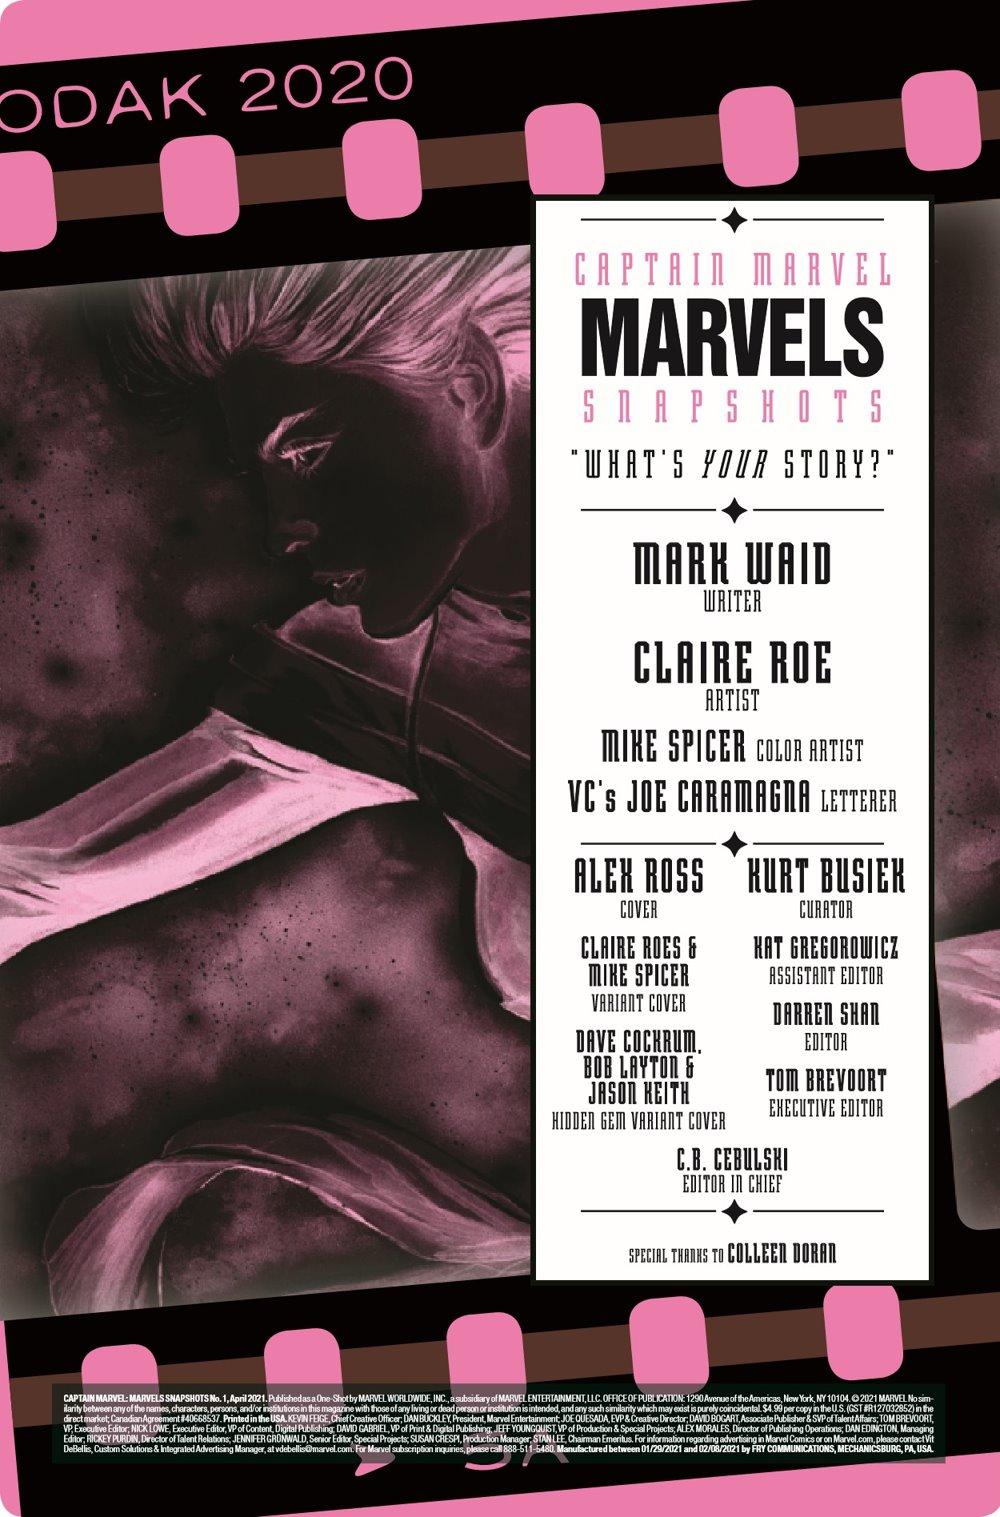 CAPMARVSNAP2020001_Preview-2 ComicList Previews: CAPTAIN MARVEL MARVELS SNAPSHOTS #1